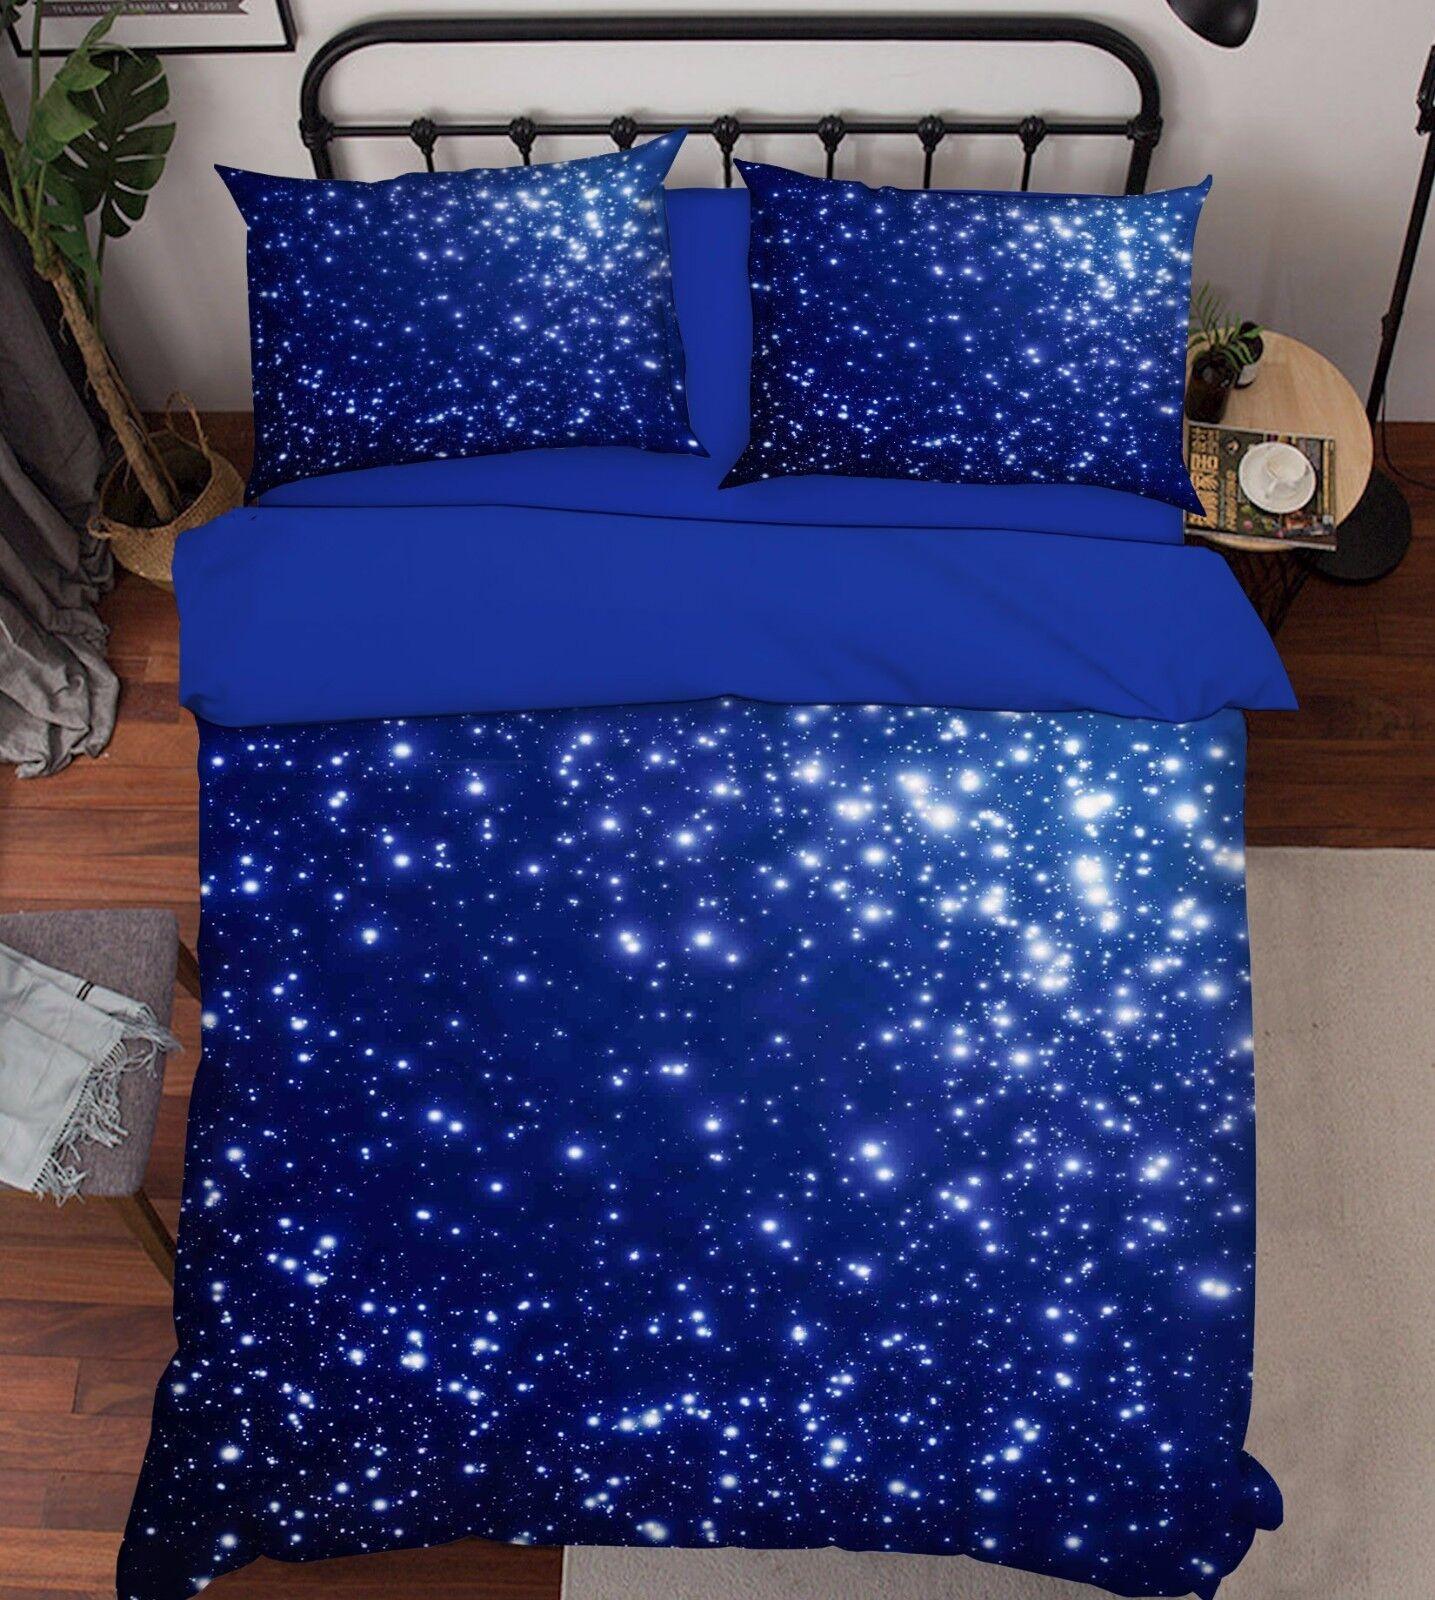 3D Shiny Stars 2 Bed Pillowcases Quilt Duvet Cover Set Single Queen King Size AU